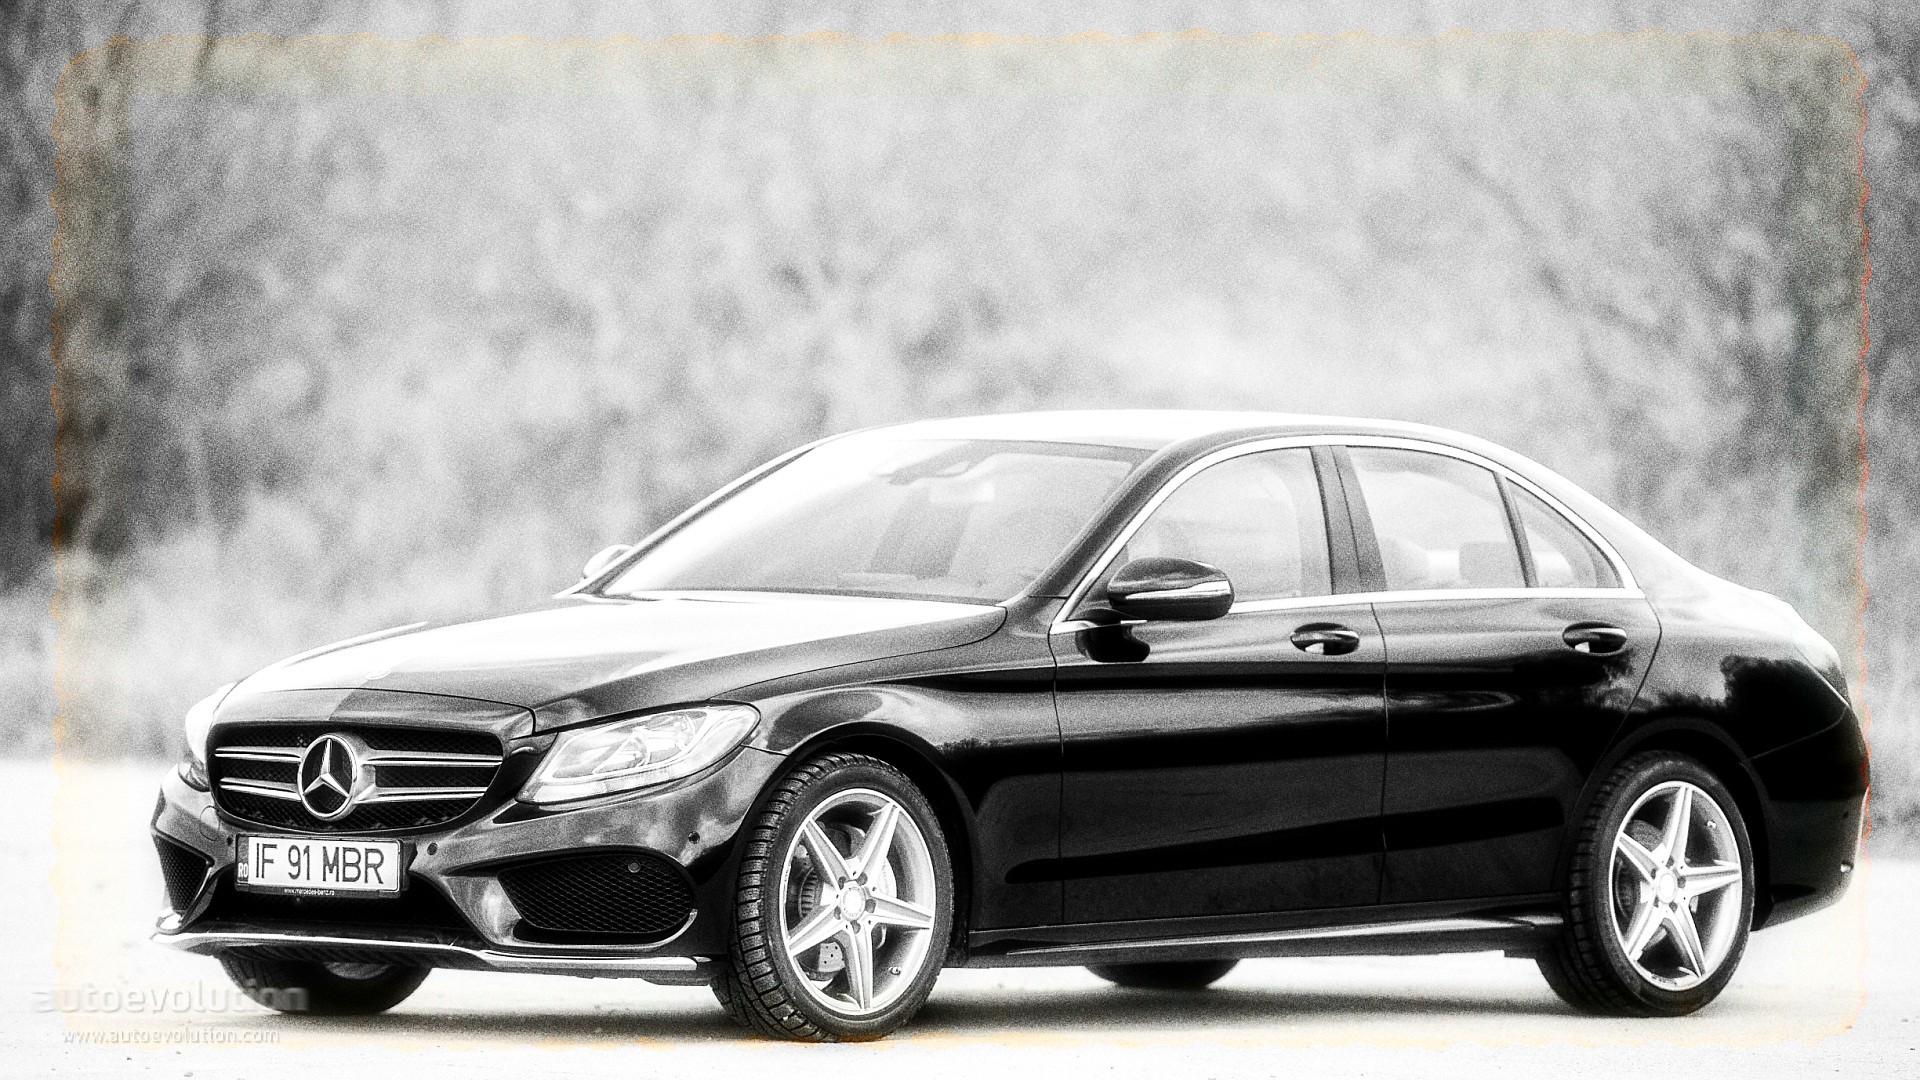 2015 mercedes benz c class review autoevolution for 2015 mercedes benz c350